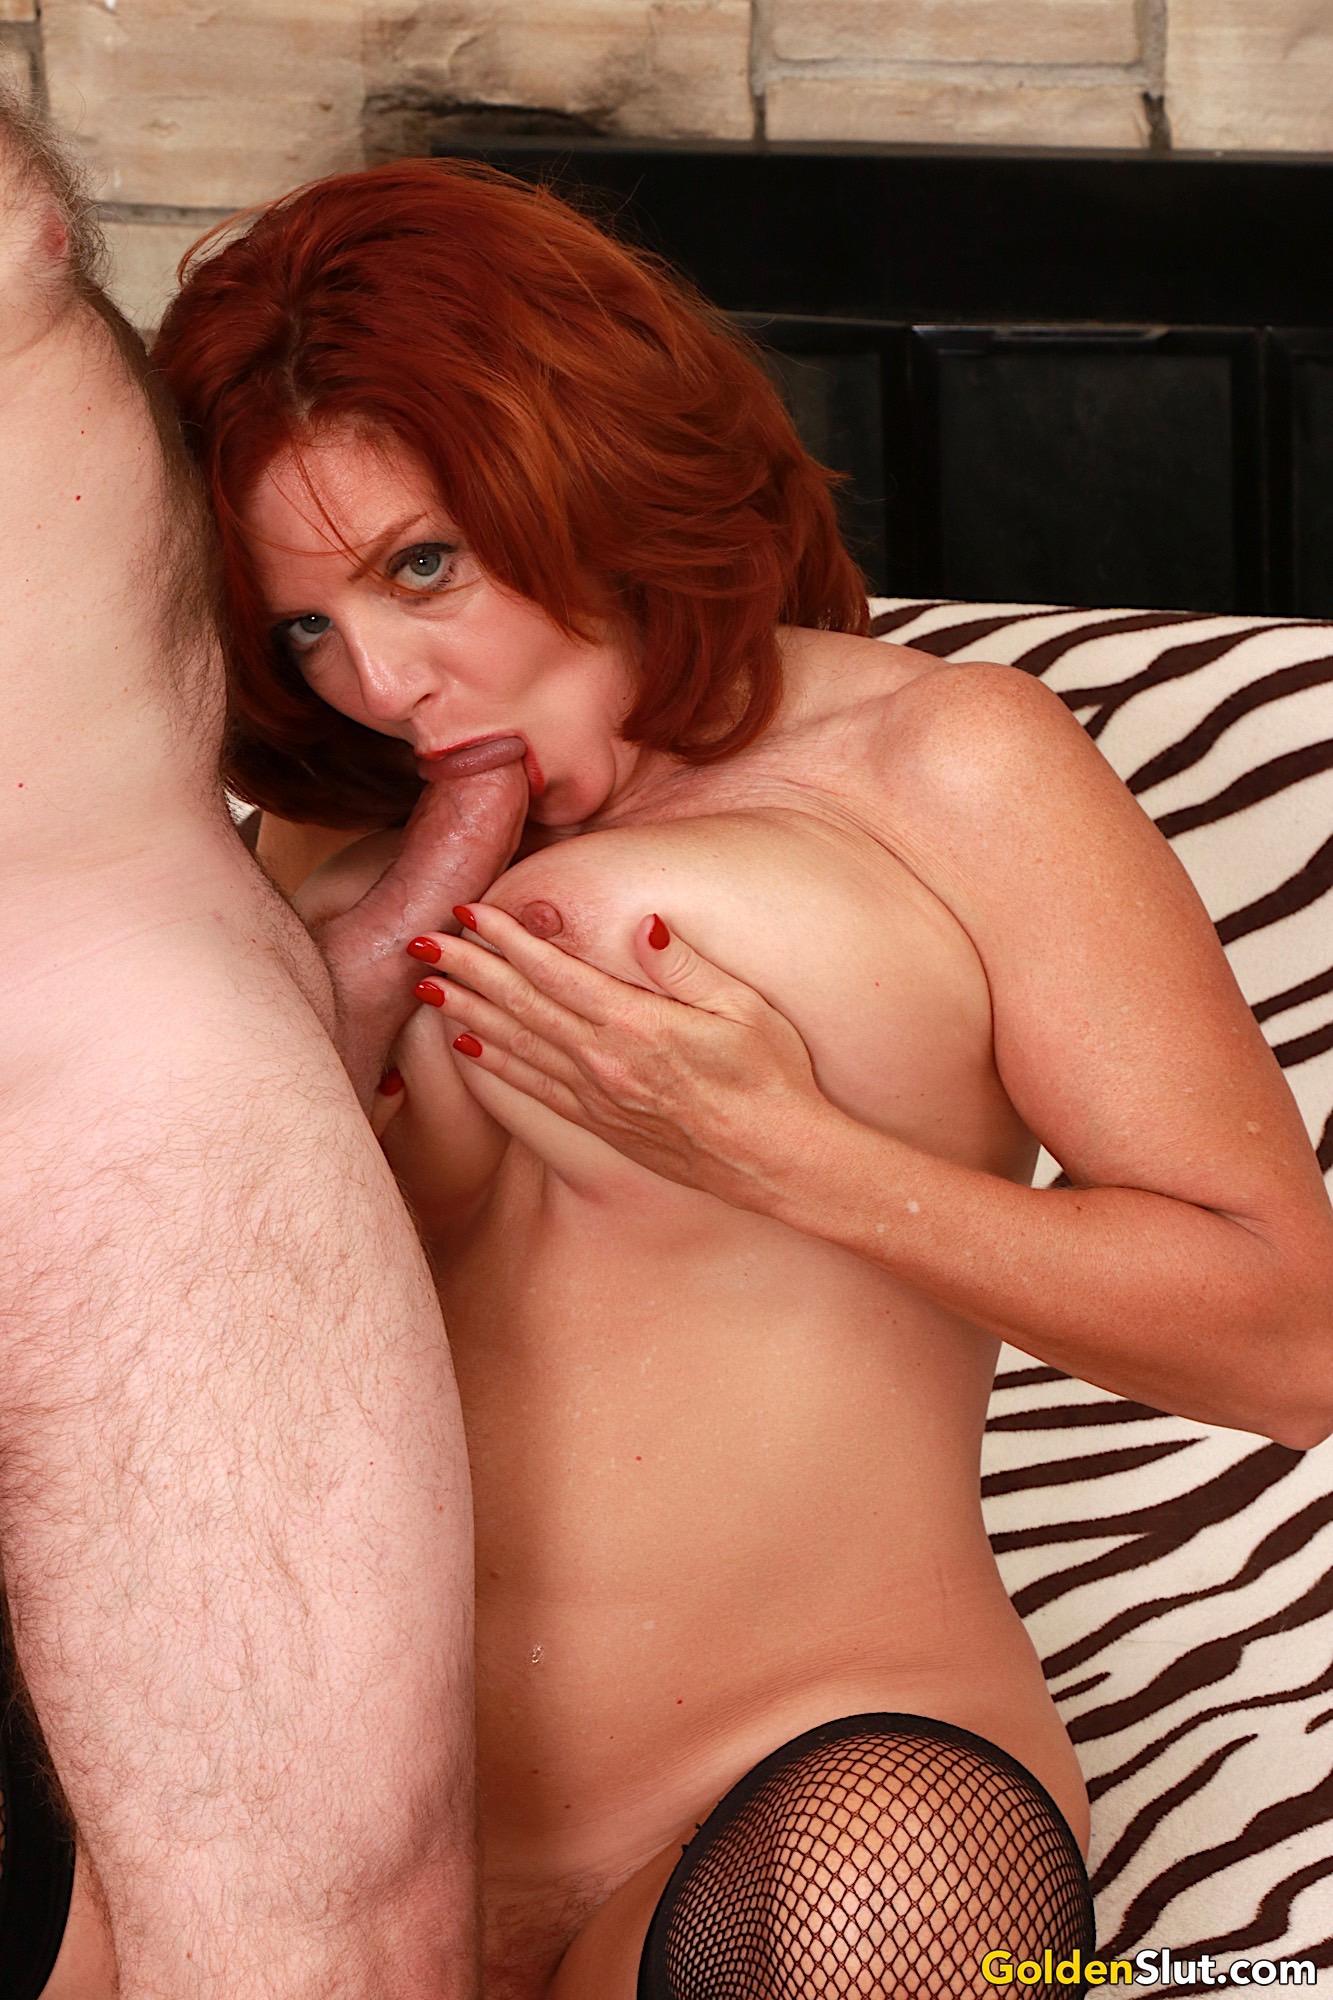 Mature Redhead Big Tits